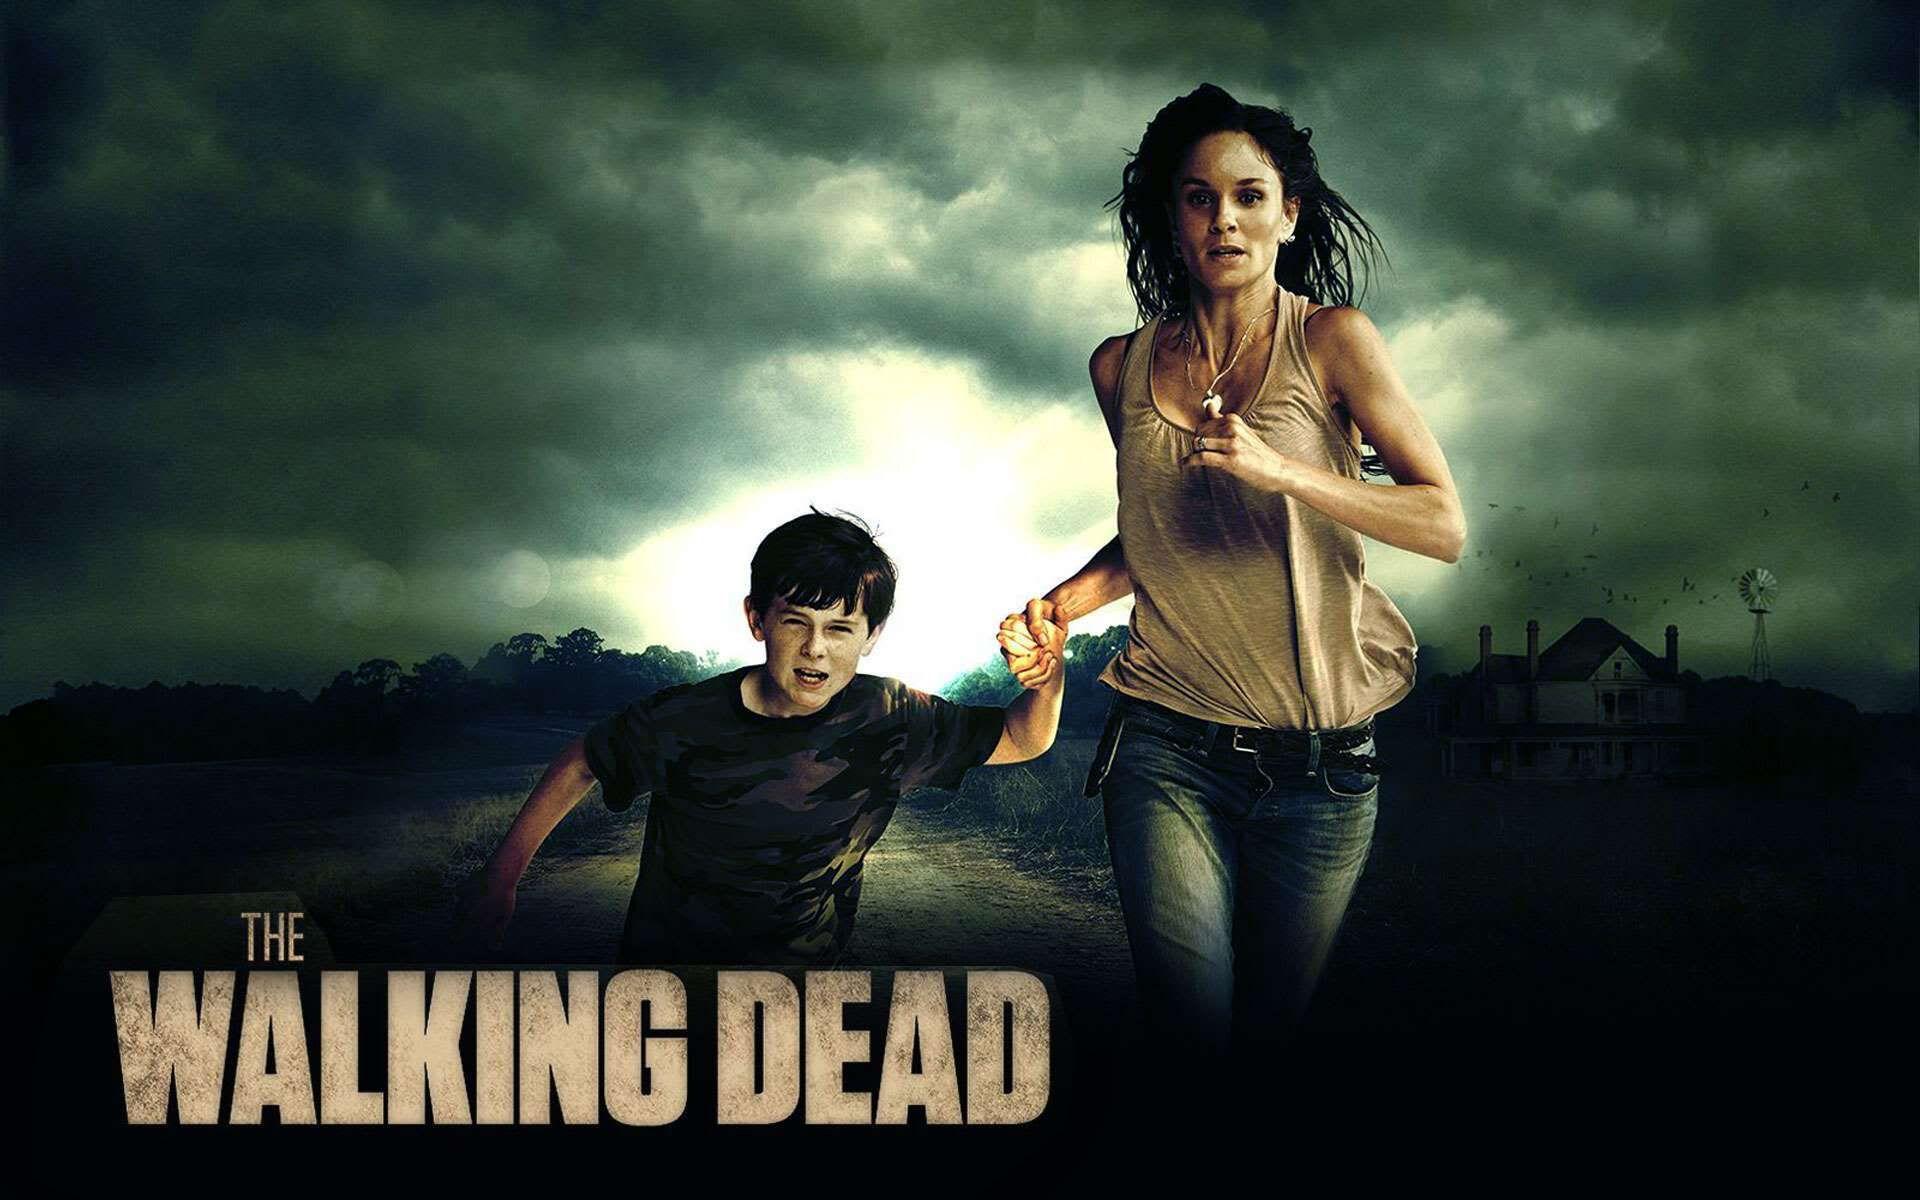 The Walking Dead Backgrounds Wallpaper High Definition High Quality Widescreen Walking Dead Background The Walking Dead Tv The Walking Dead